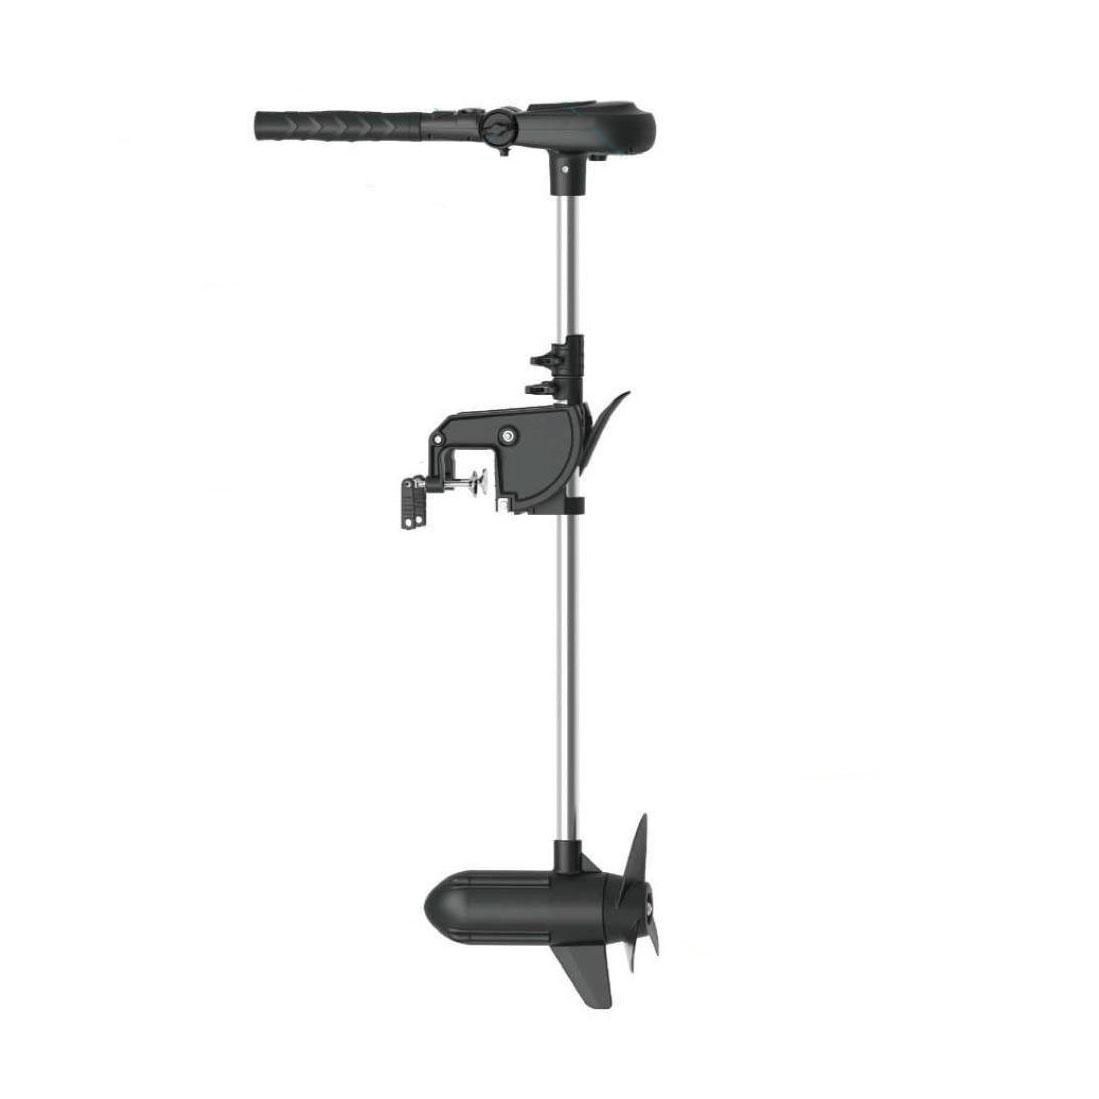 Лодочный электромотор Haswing Protruar 5.0 160